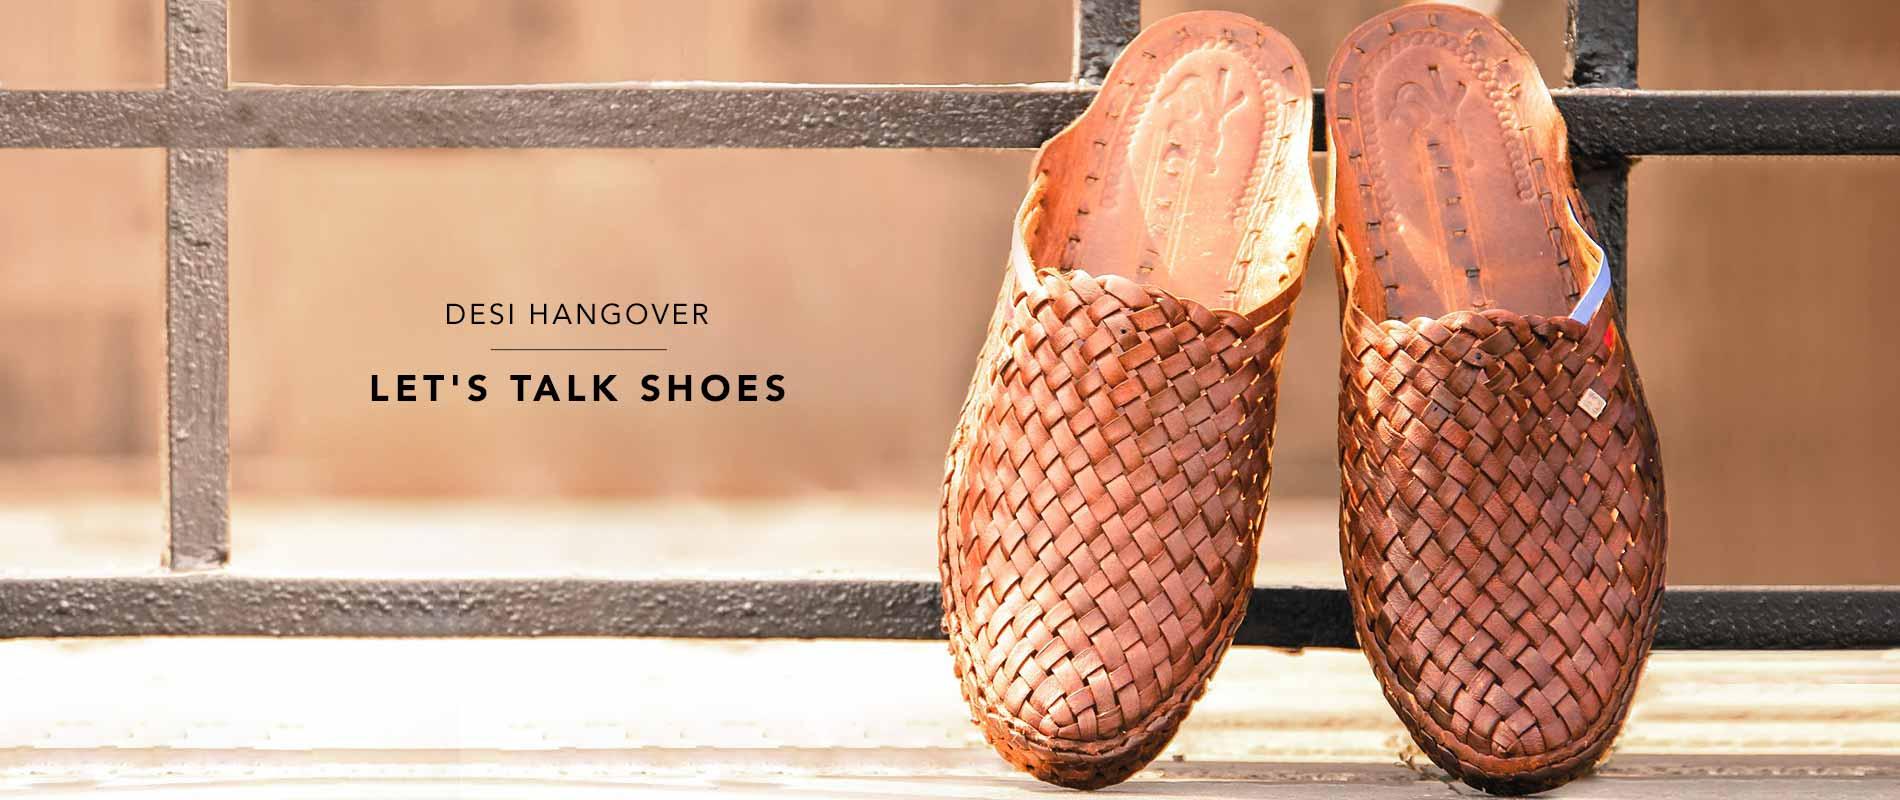 170213DEH022_Desi_hangover_Footwear_Relaunch_5698